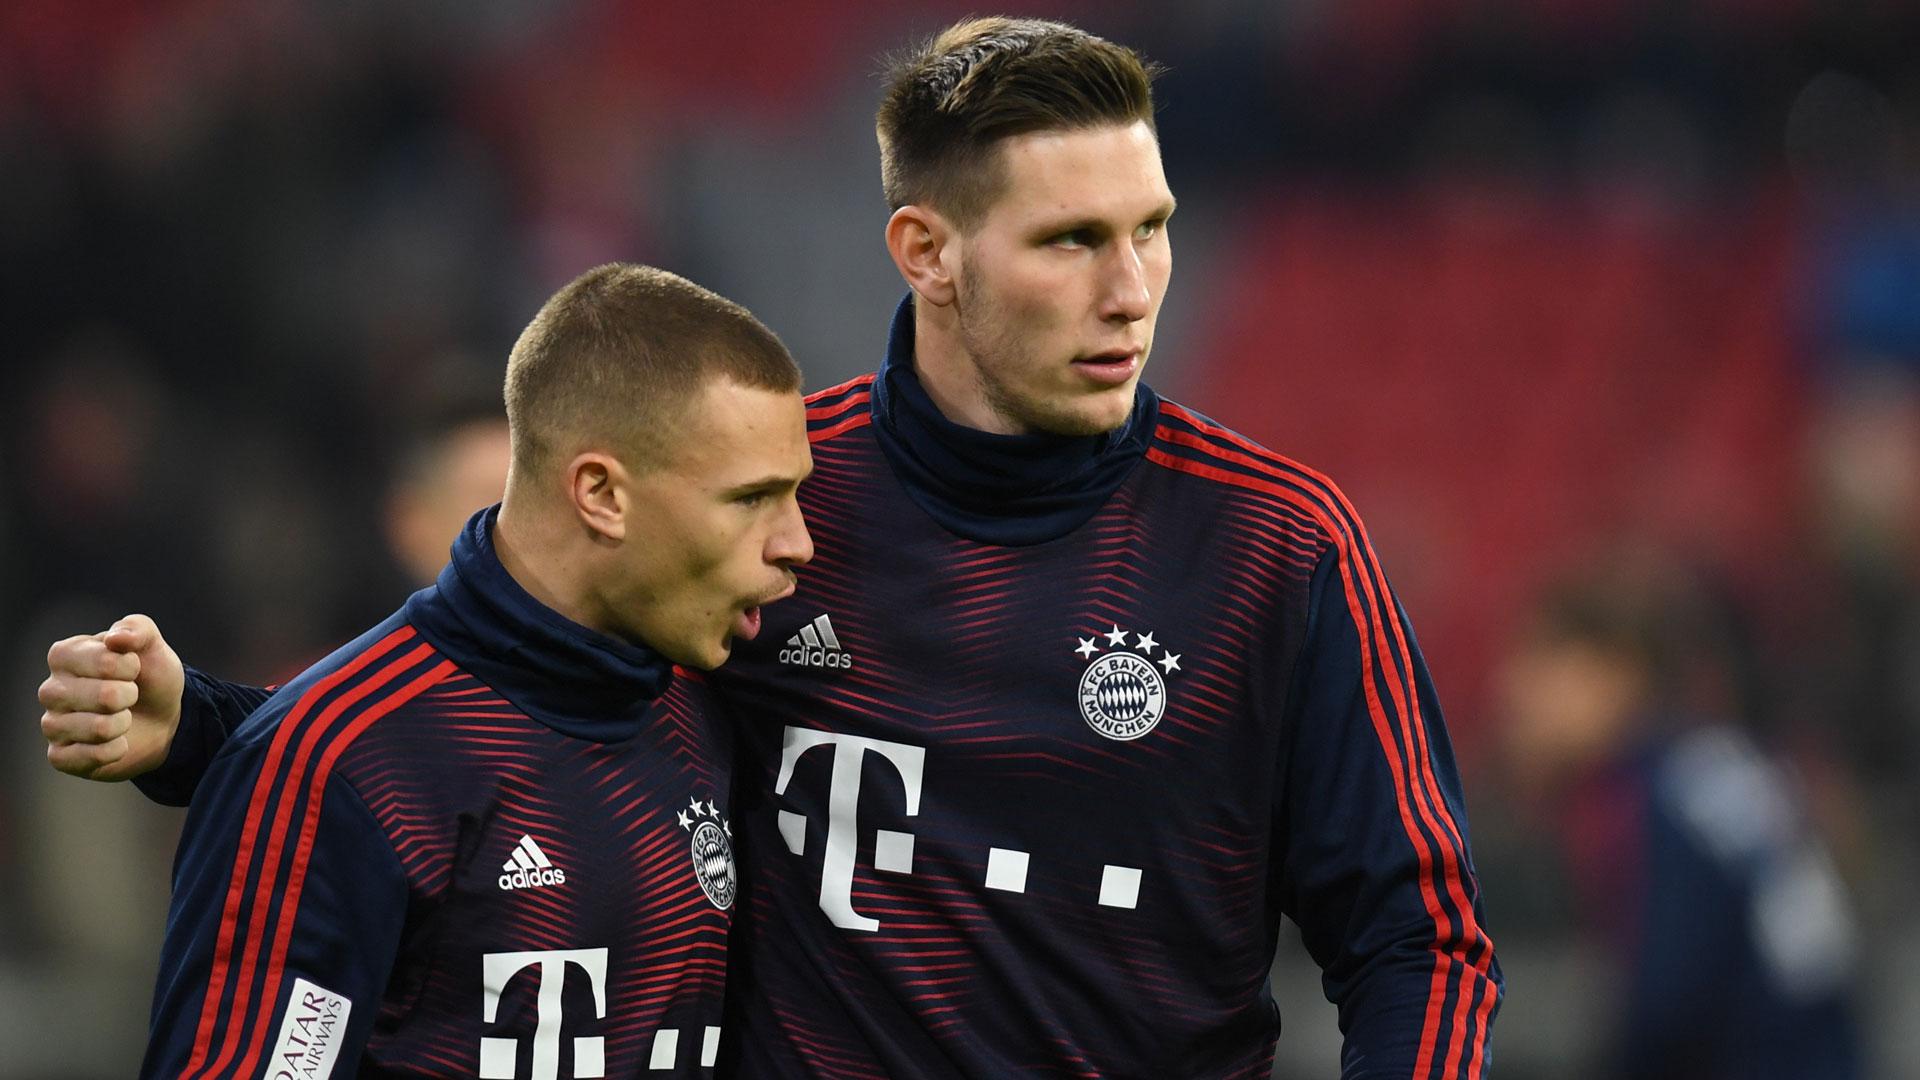 DFB-Duo Kimmich und Süle: Erst Krach, jetzt dicke Freunde   Goal.com